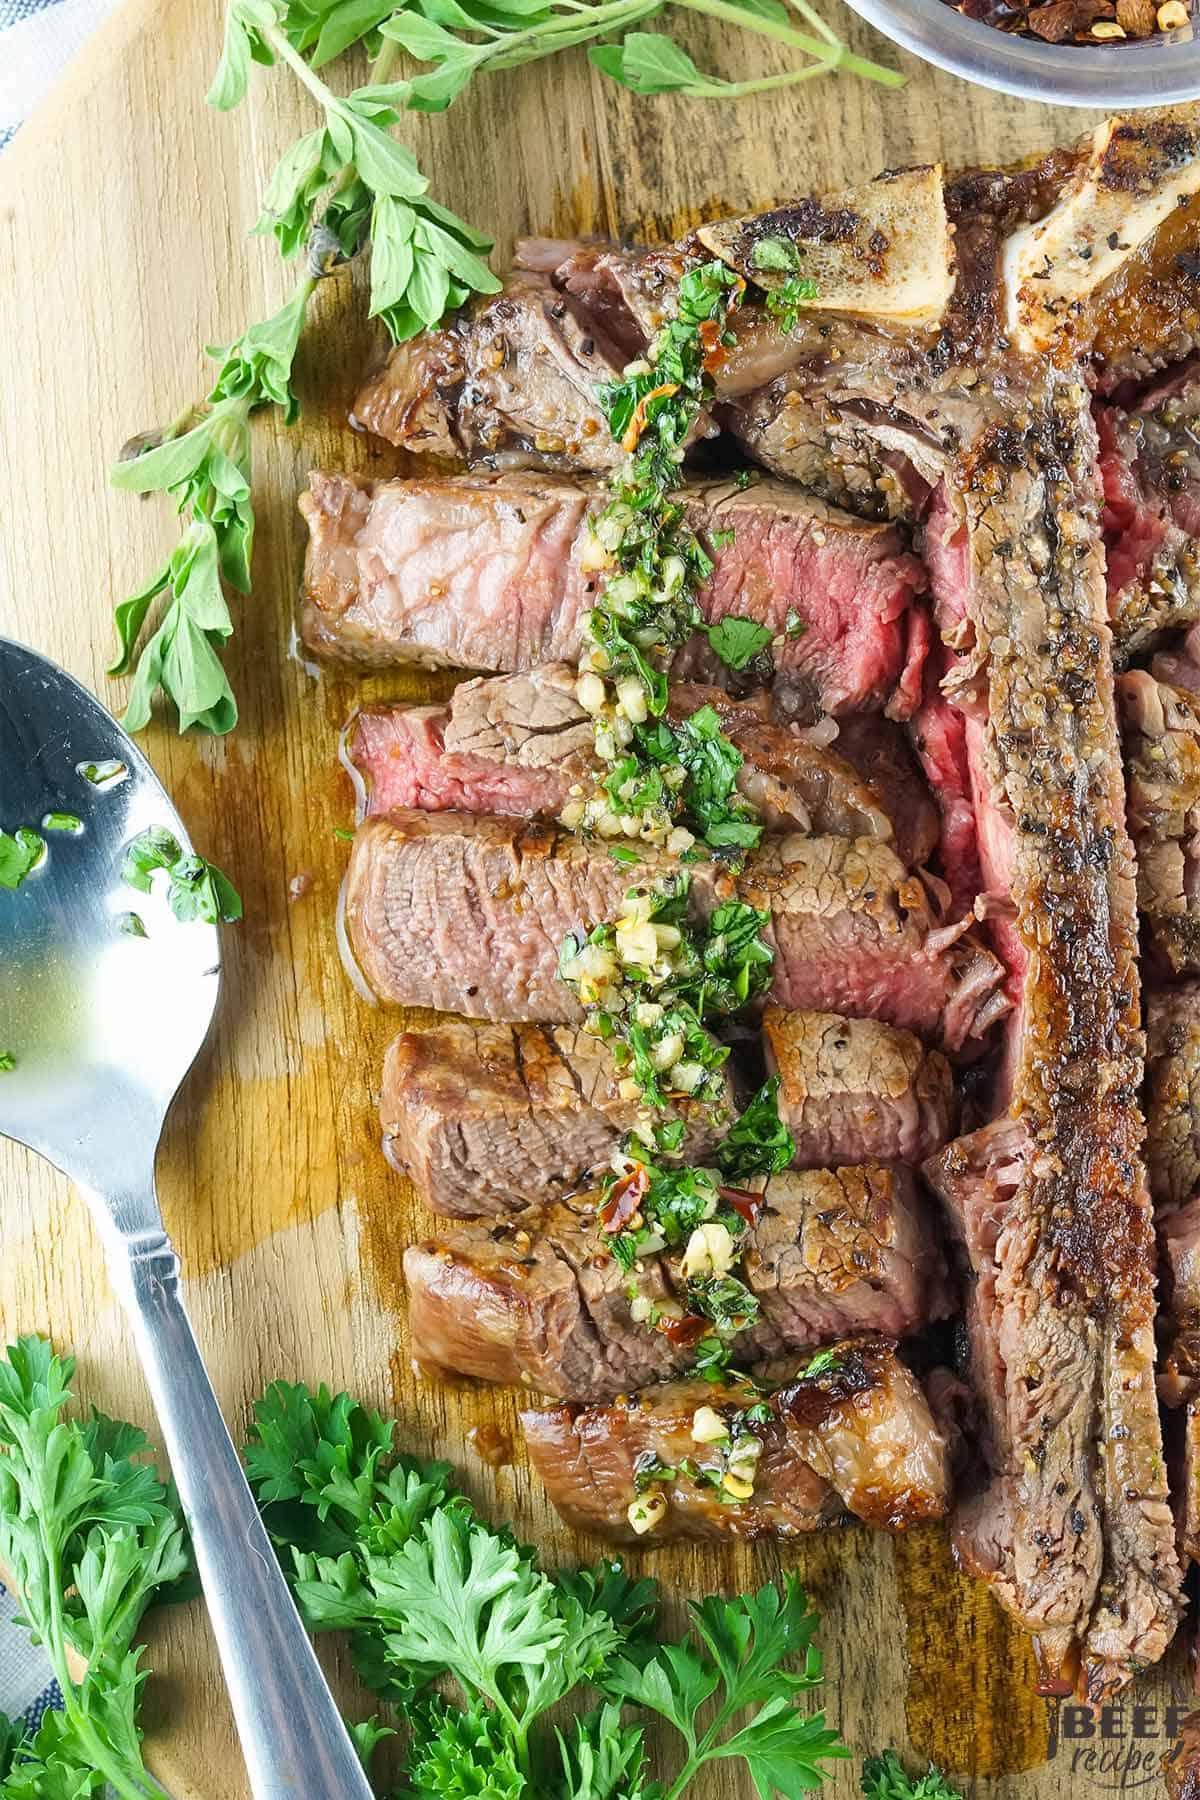 Slices of porterhouse steak with chimichurri sauce